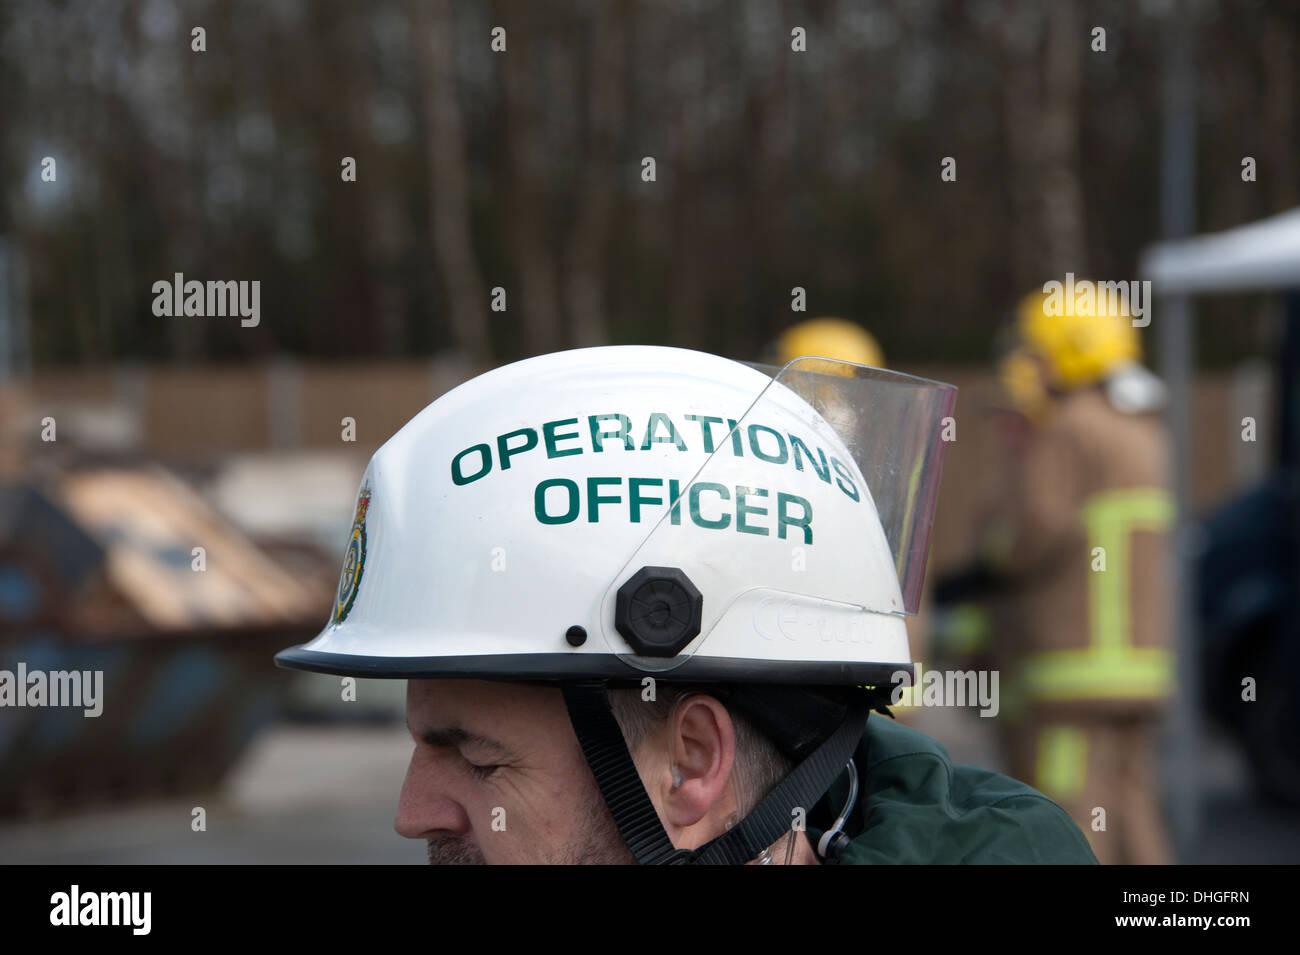 Image result for Operation Officer